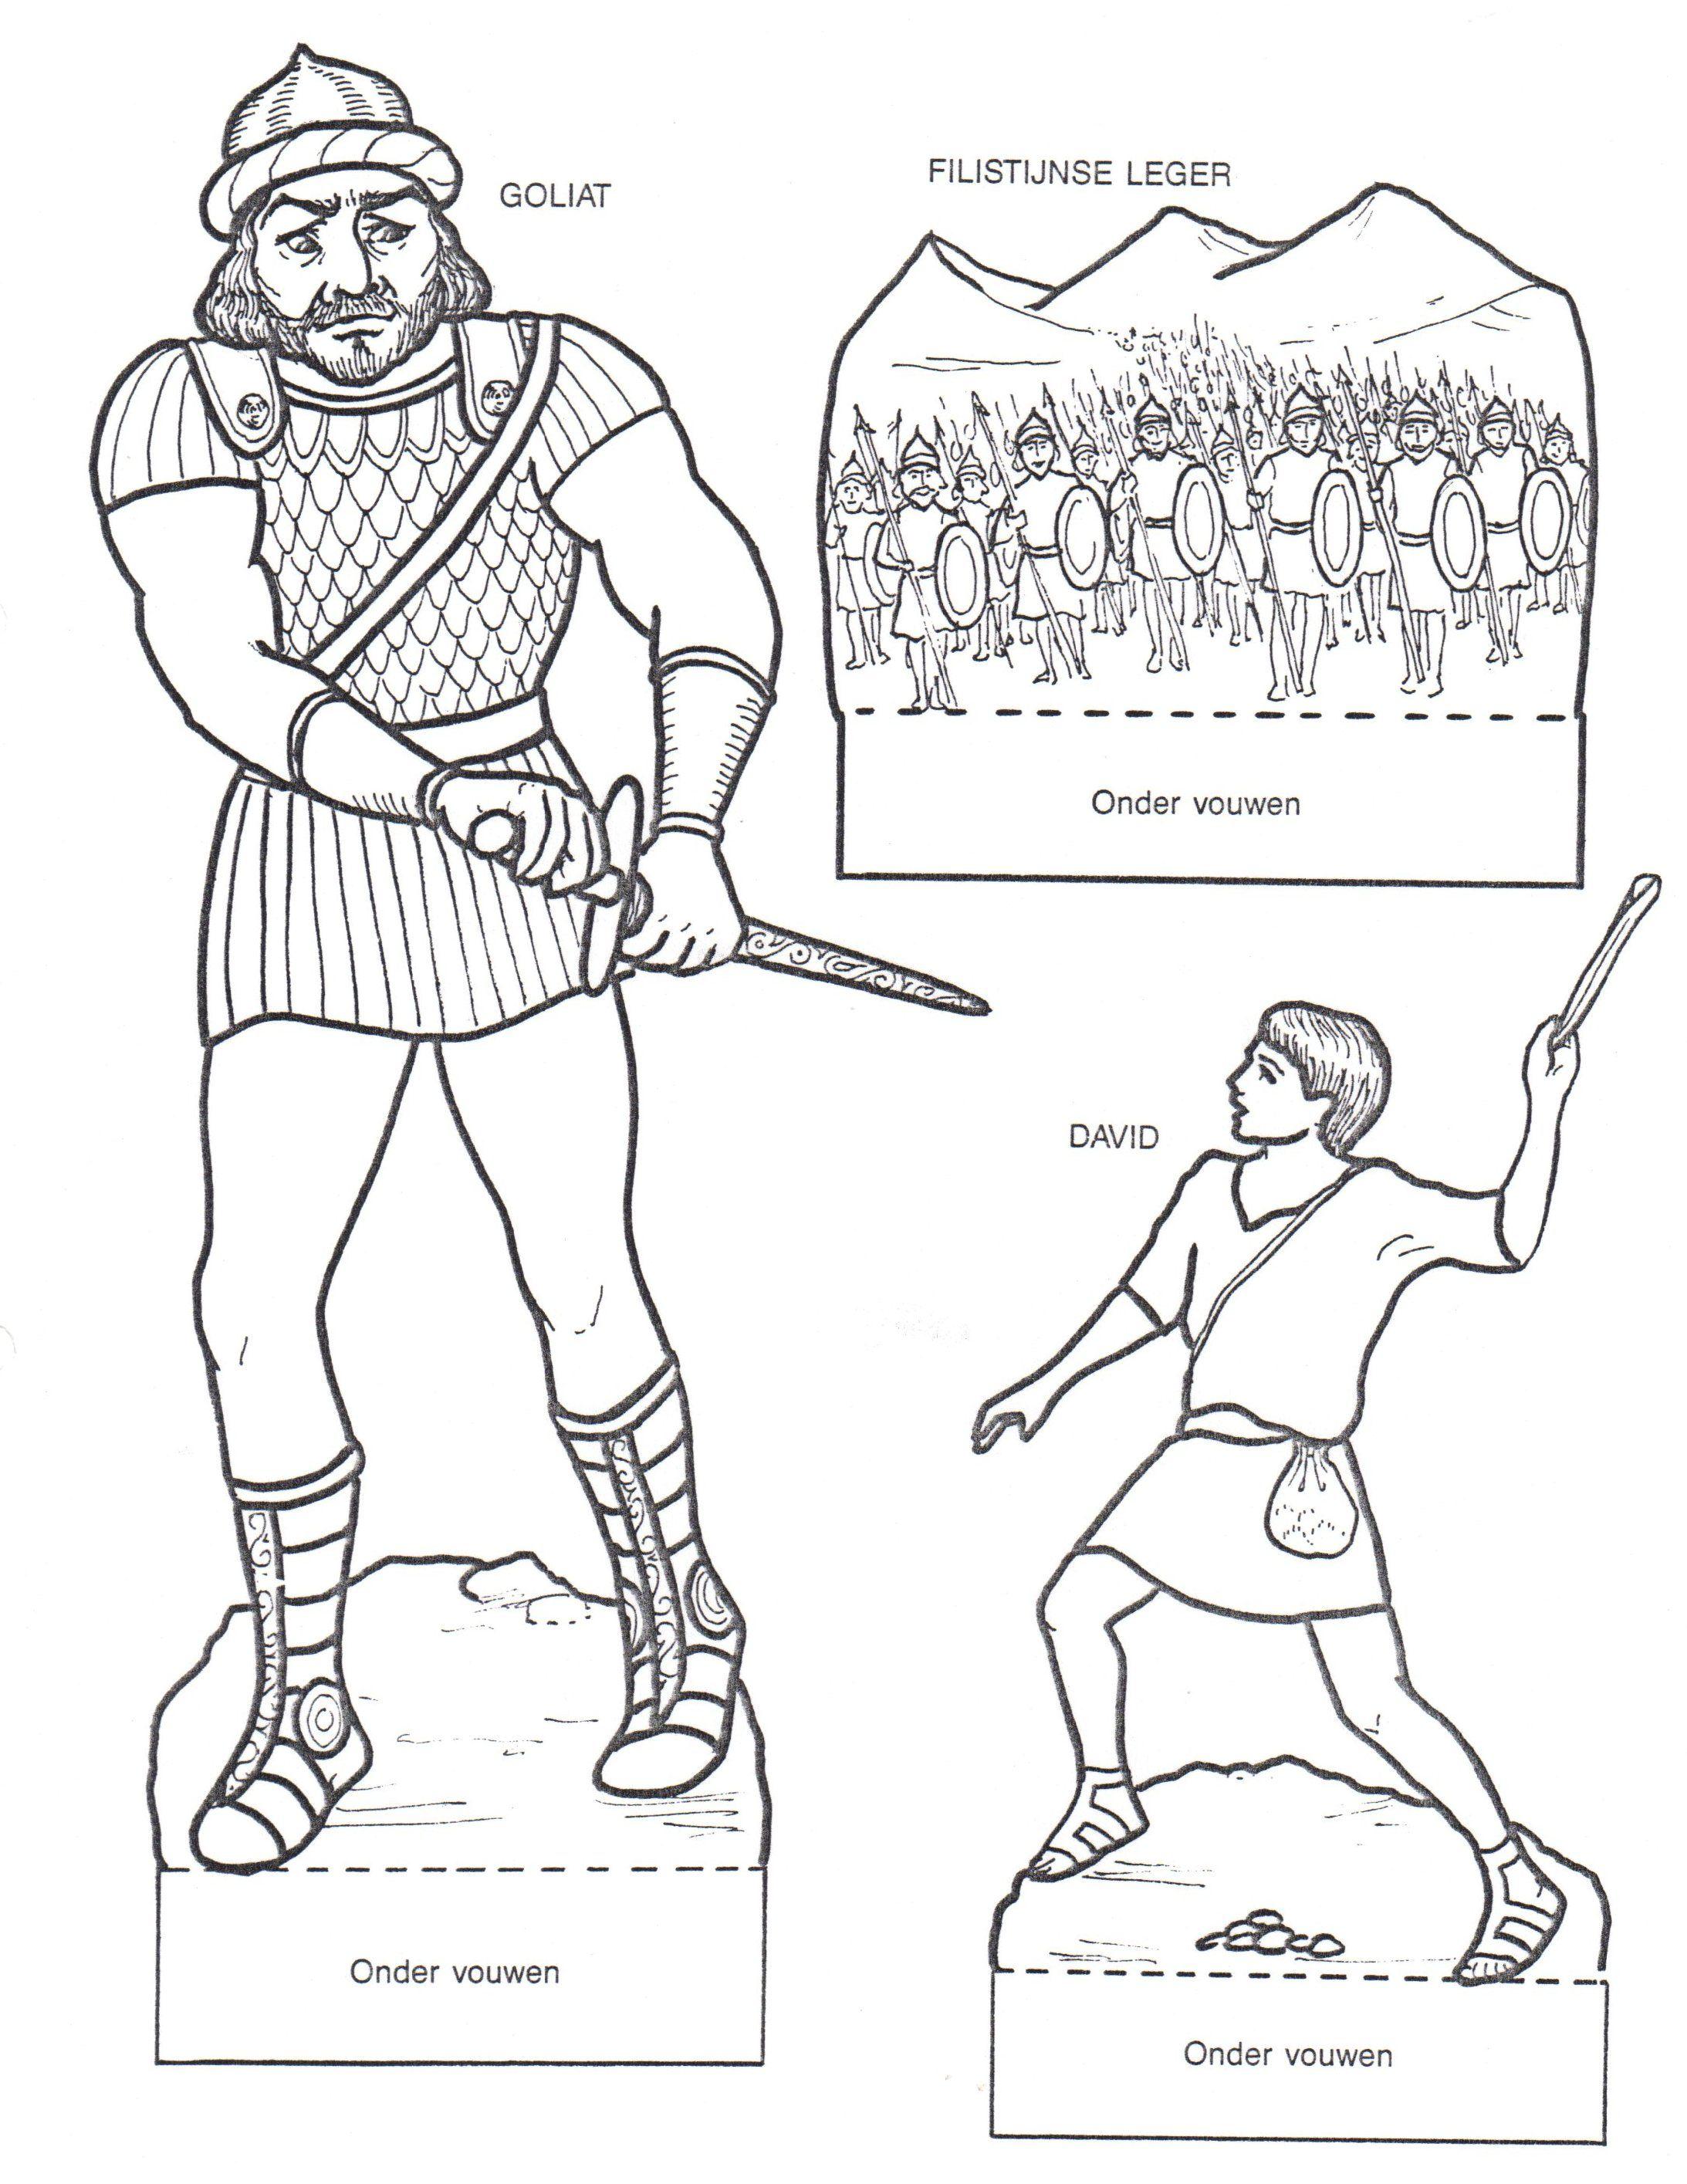 David and Goliath printables